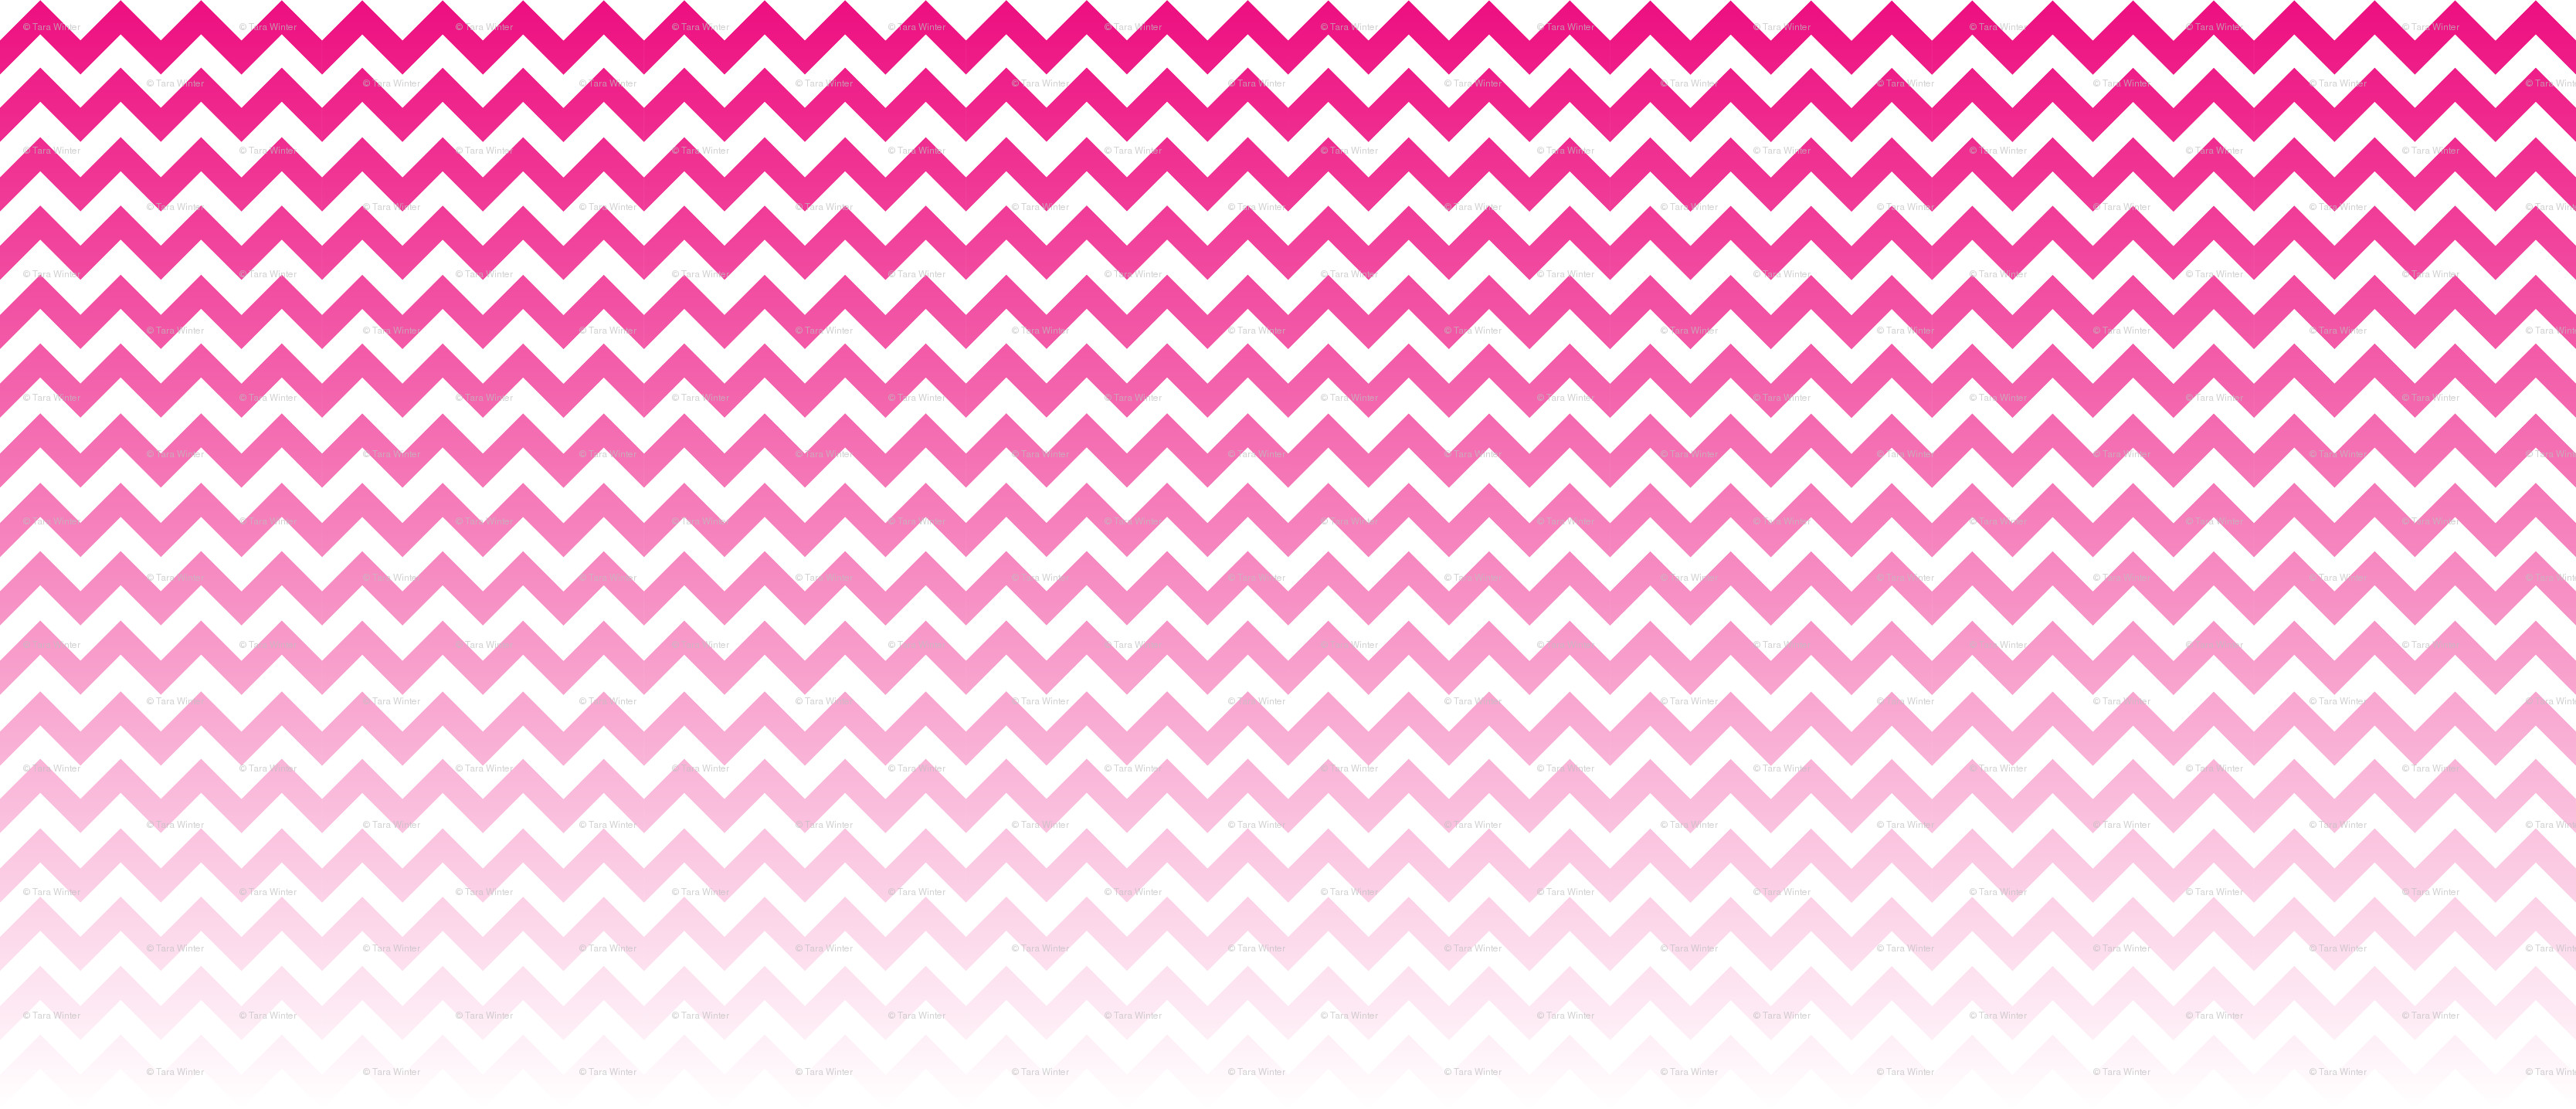 Ombre Chevron Wallpaper Rrrrhot_pink_ombre_chevron.svg .